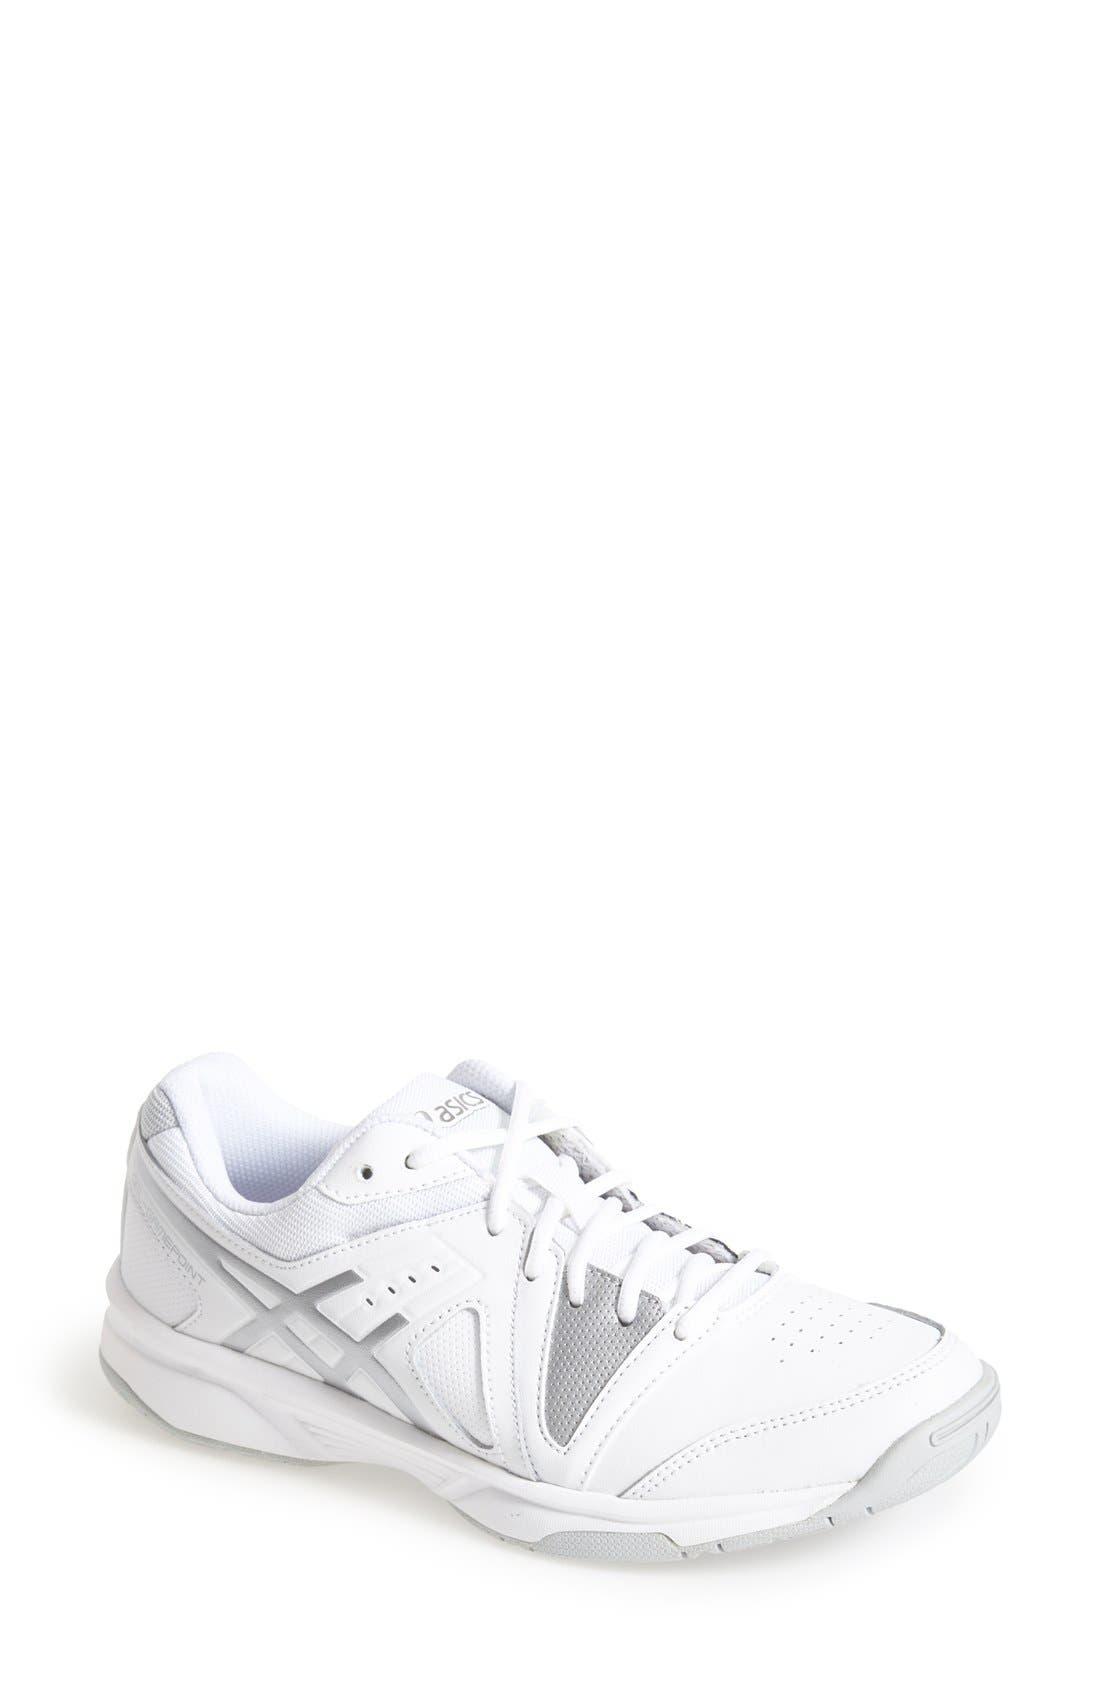 1 asics gel gamepoint tennis shoe